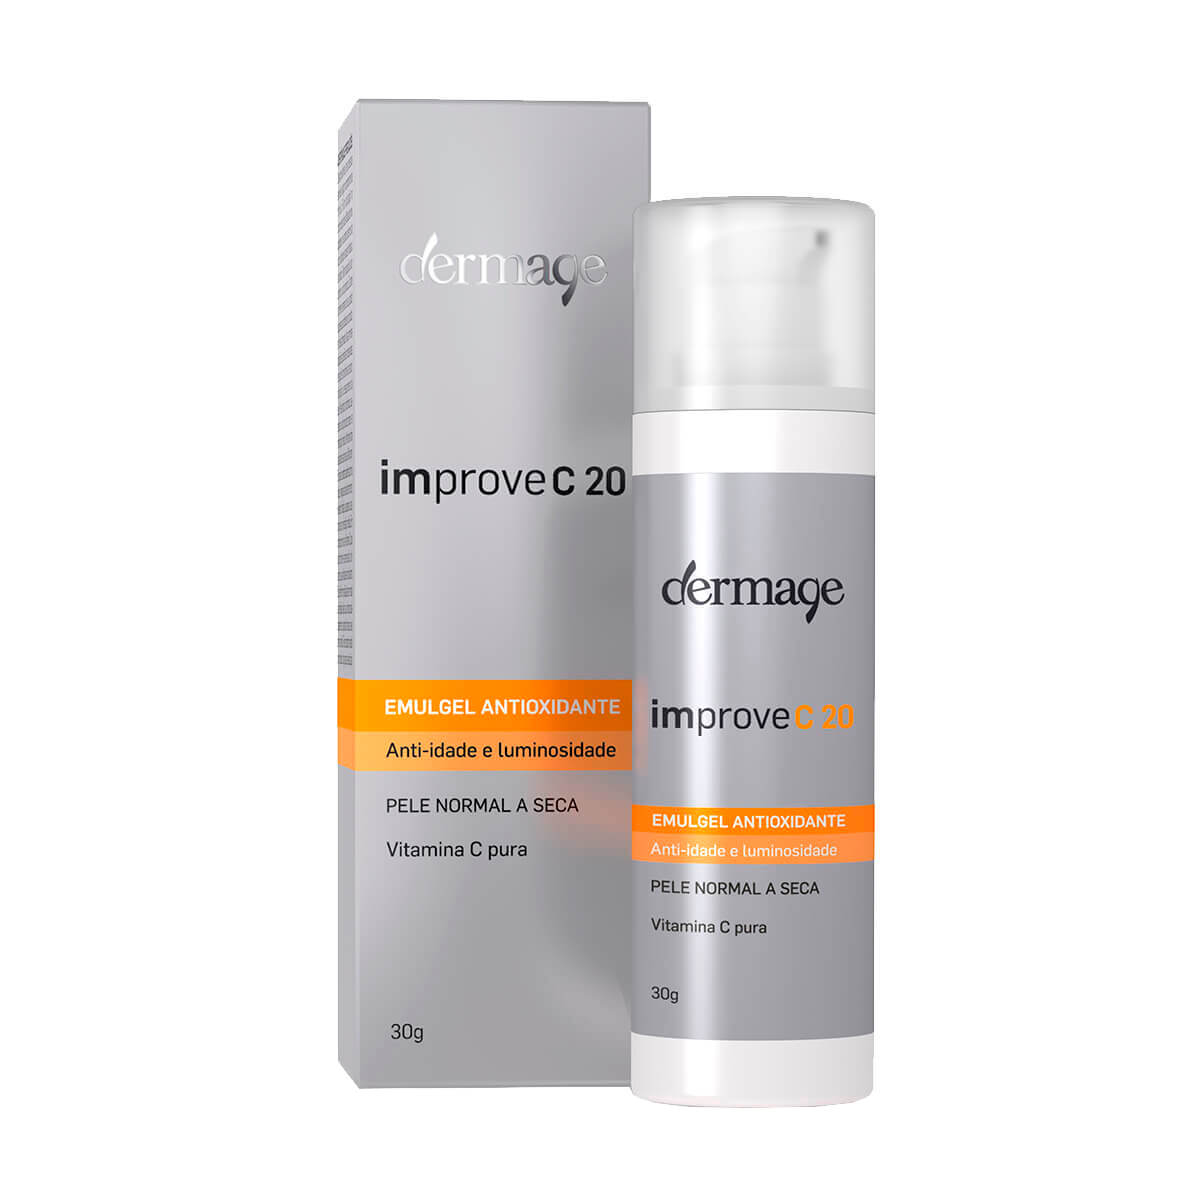 Emulgel Antioxidante Improve C 20 Dermage 30g